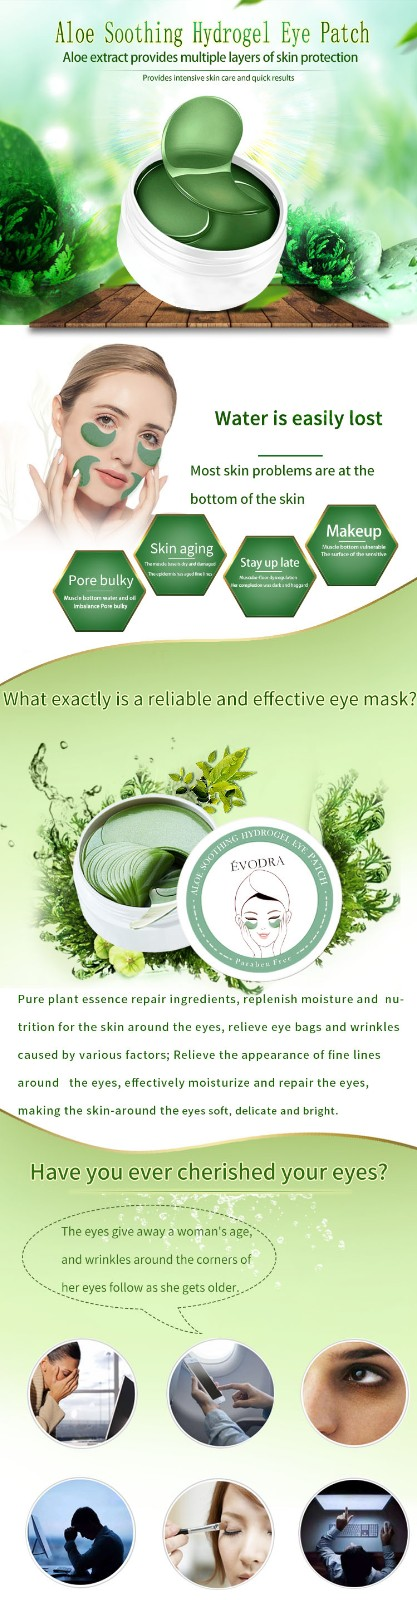 Calla-Oem Repair Eye Mask Manufacturer, Anti Aging Sleep Eye Mask | Calla